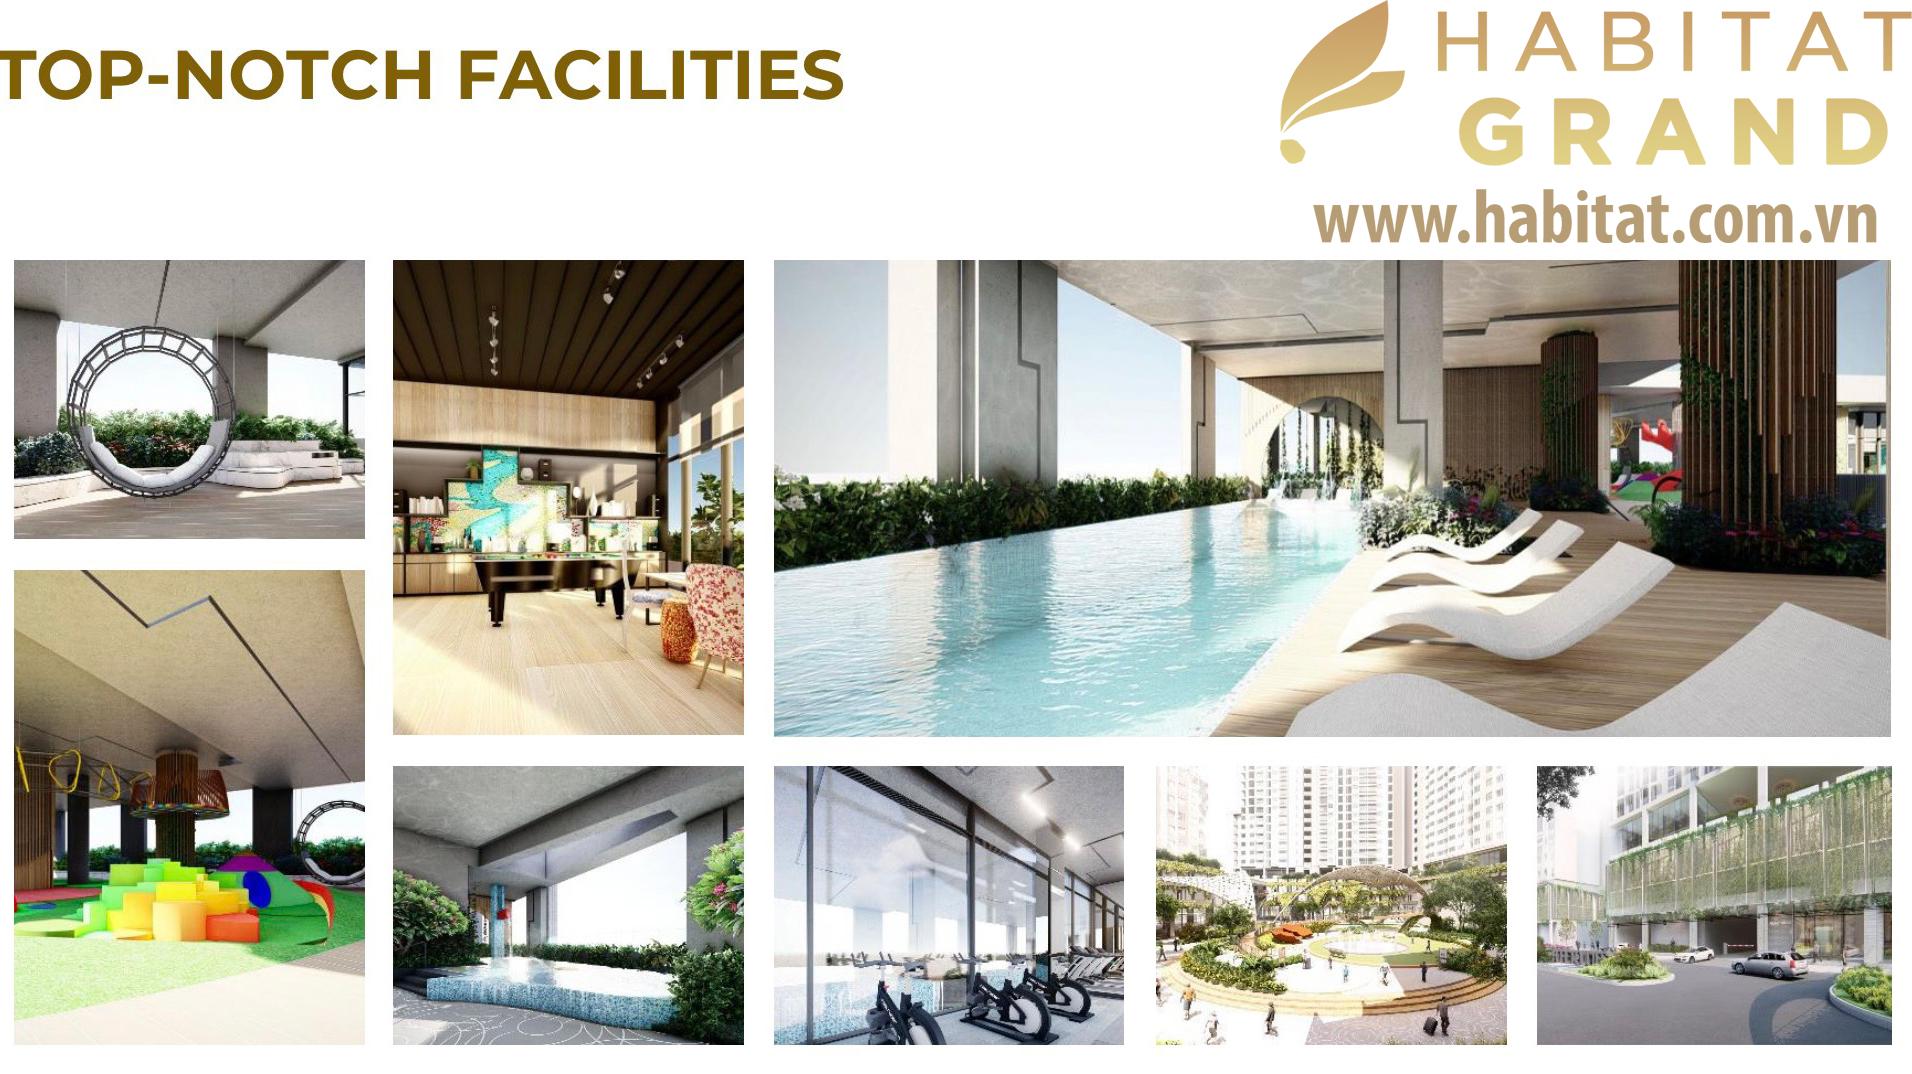 Dự án Habitat Grand